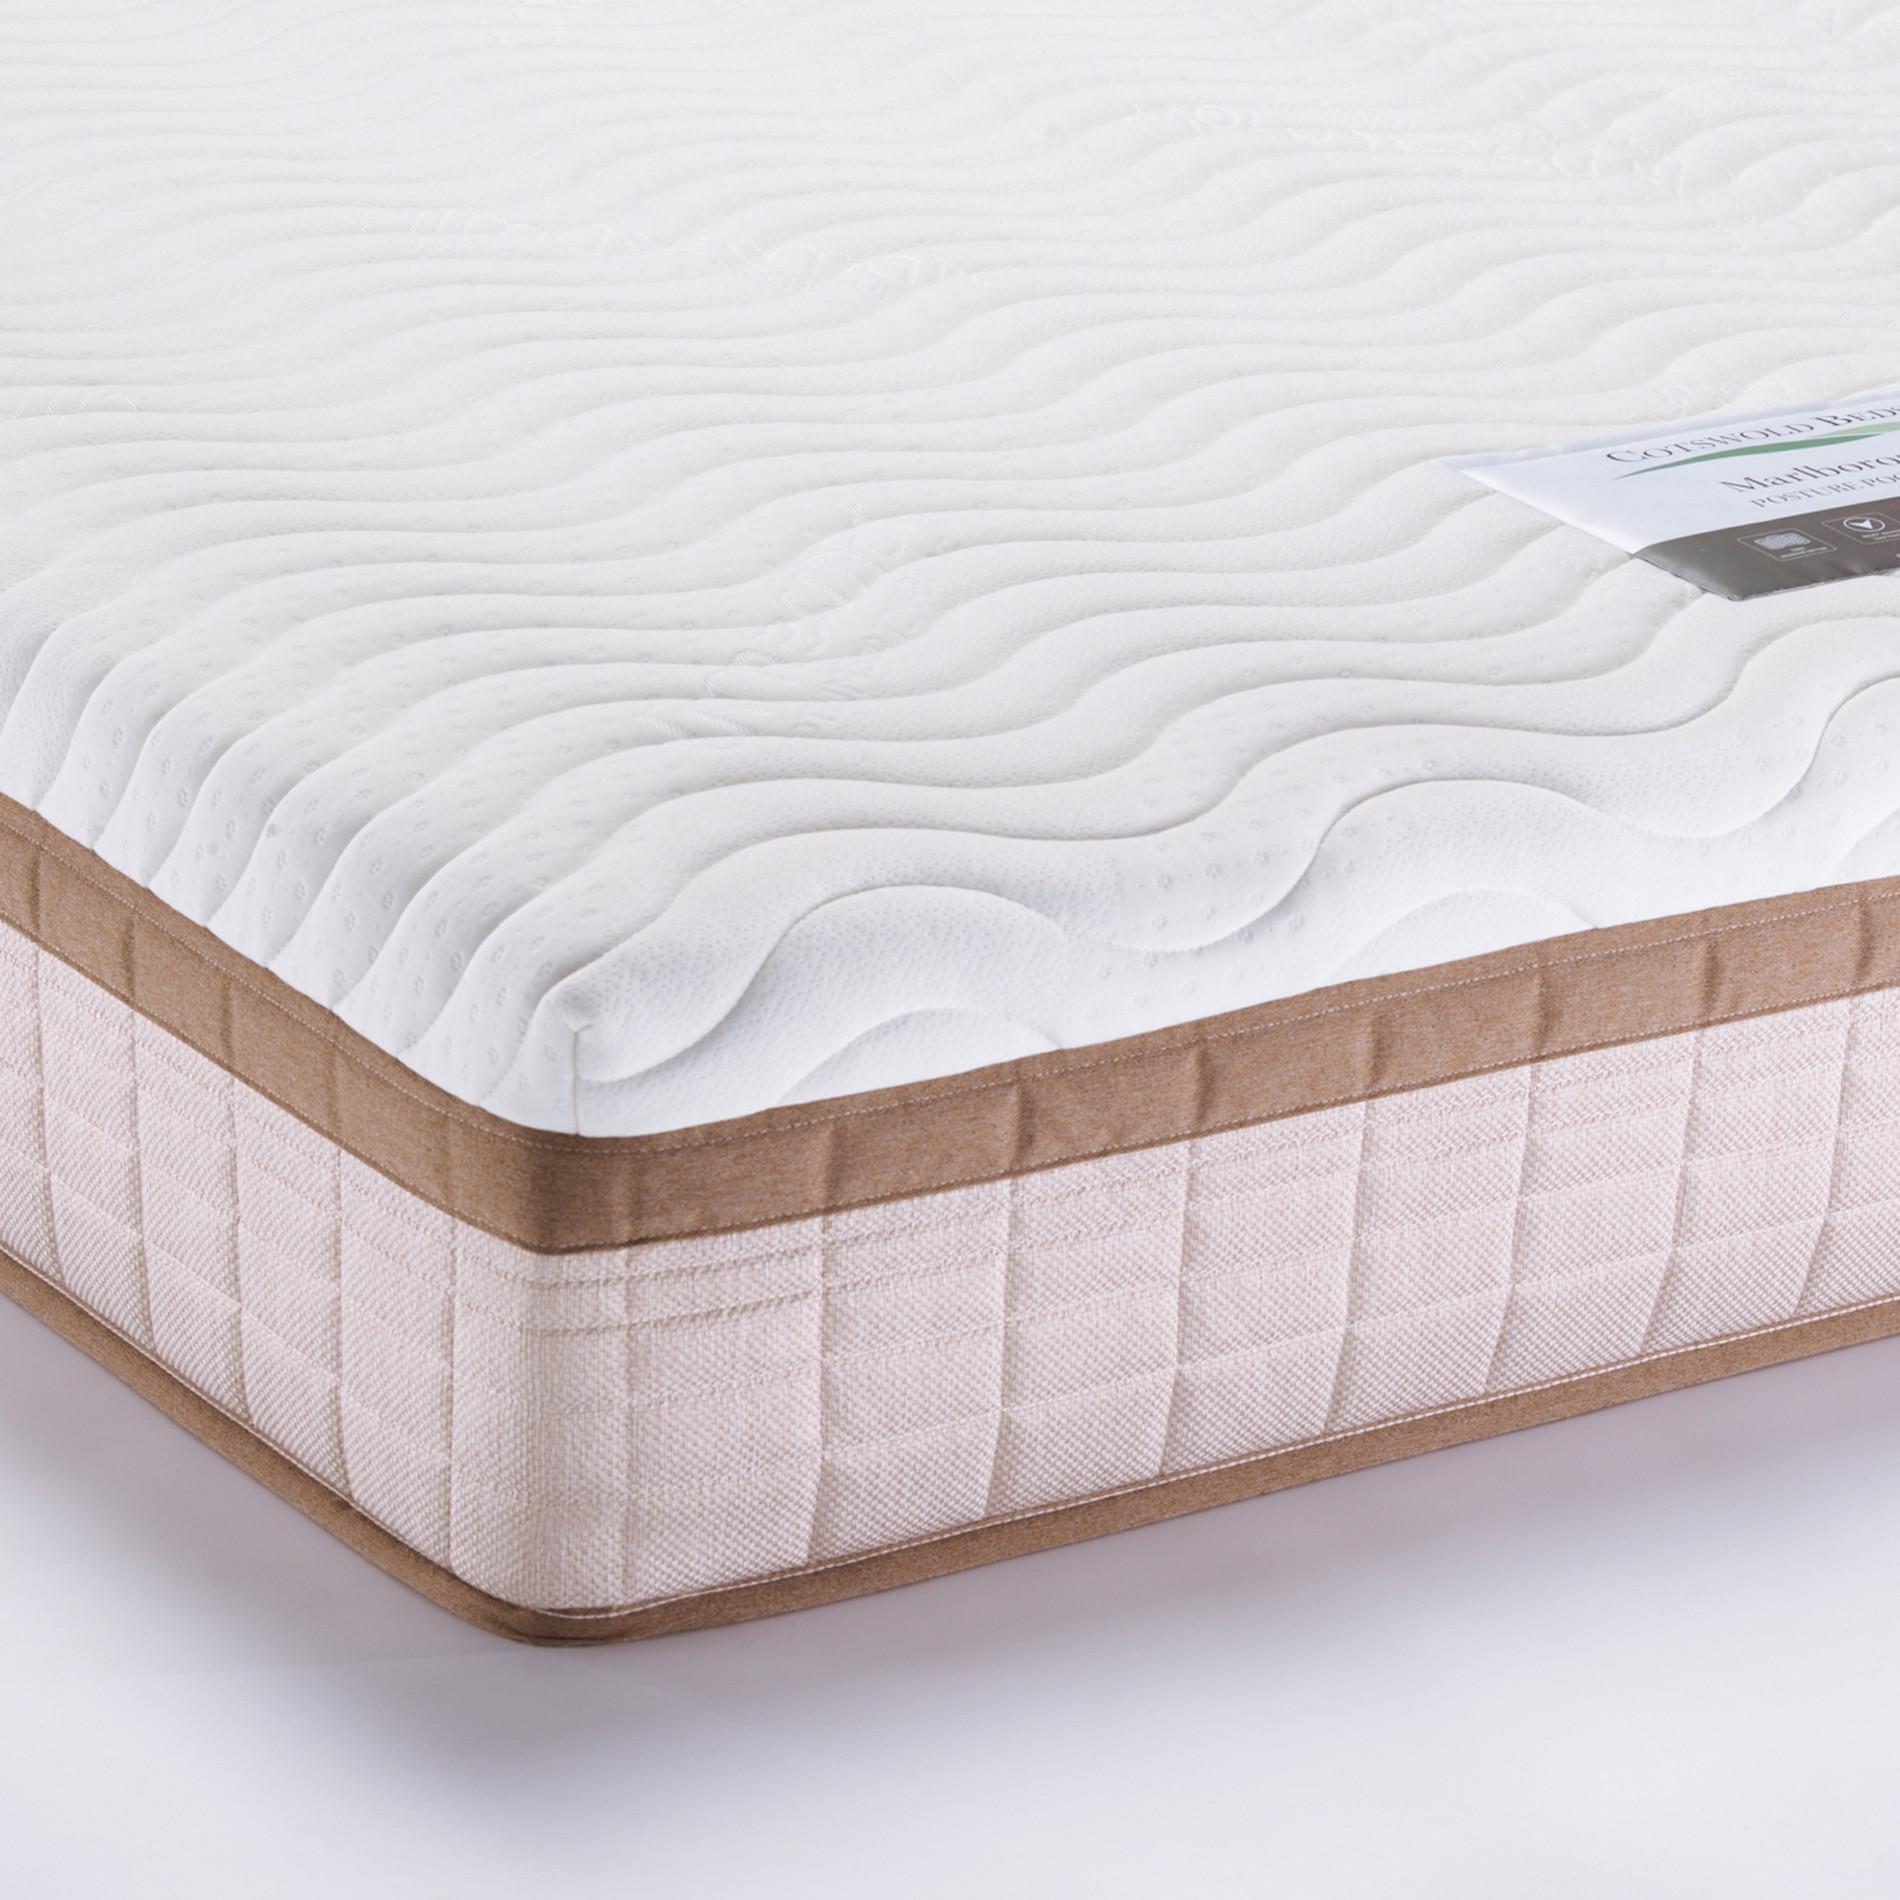 king size mattress. king size mattress s